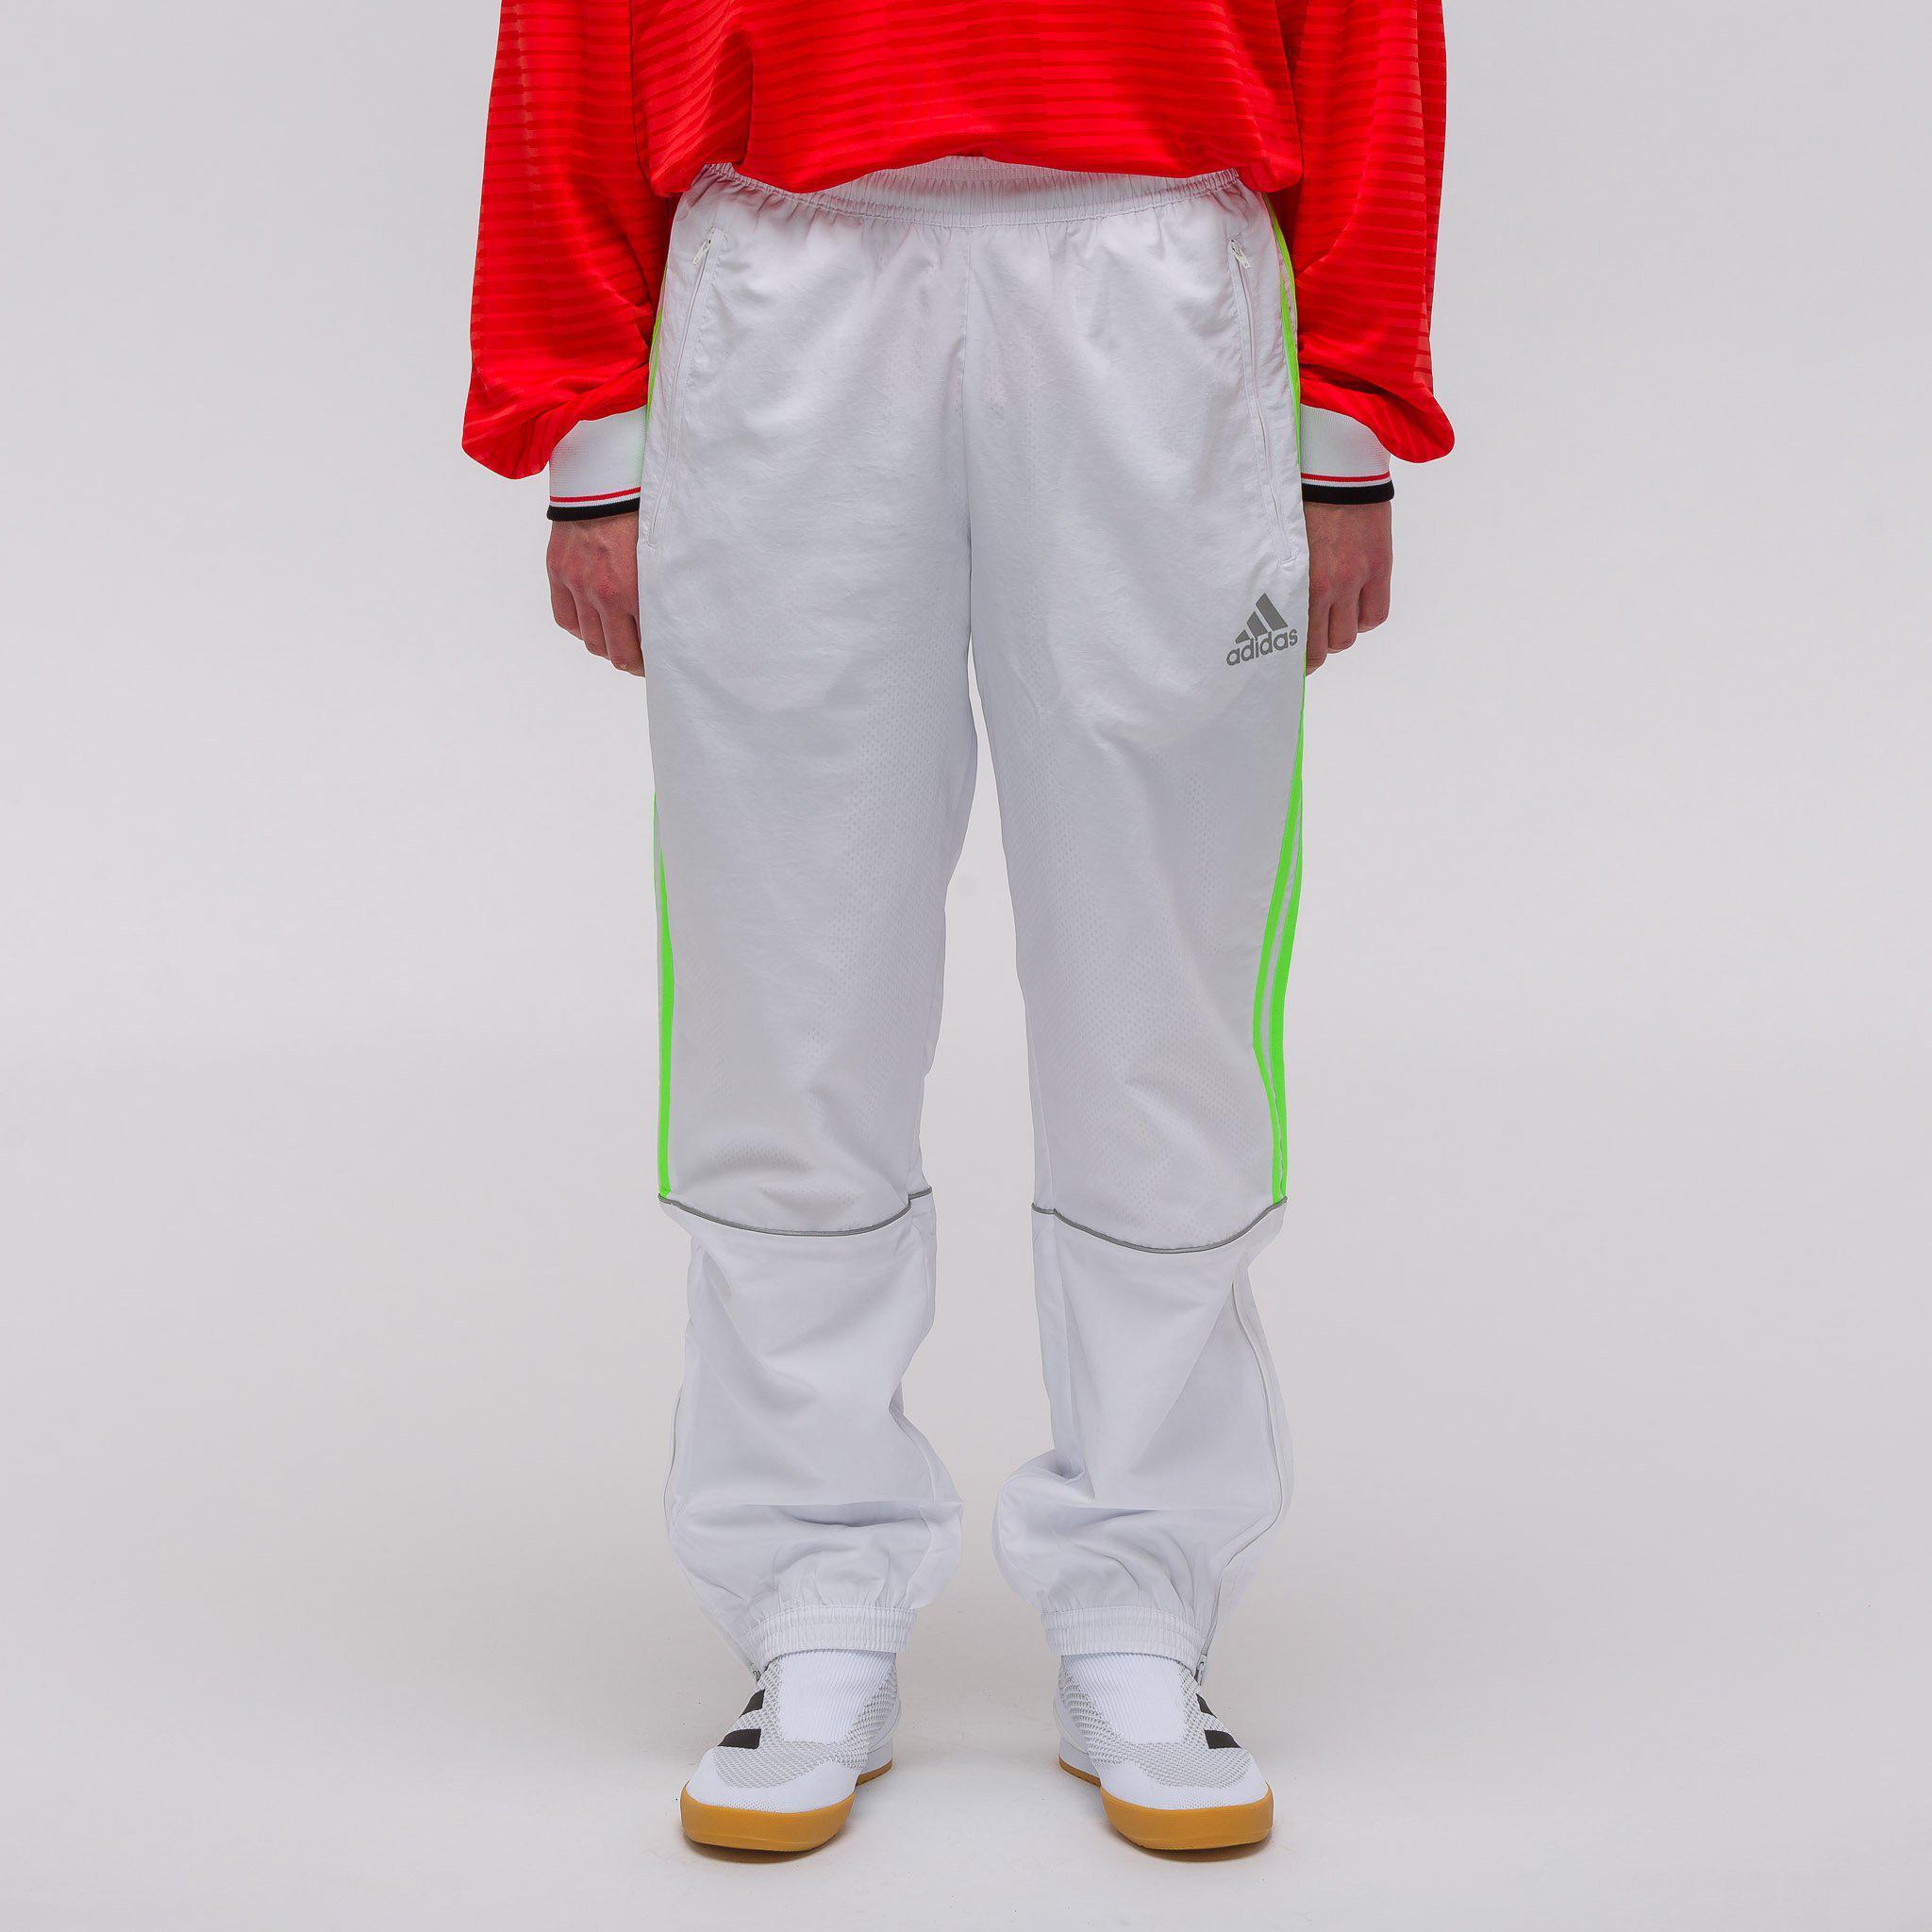 2bf1182541dd Lyst - Gosha Rubchinskiy X Adidas Track Pants In White in White for Men